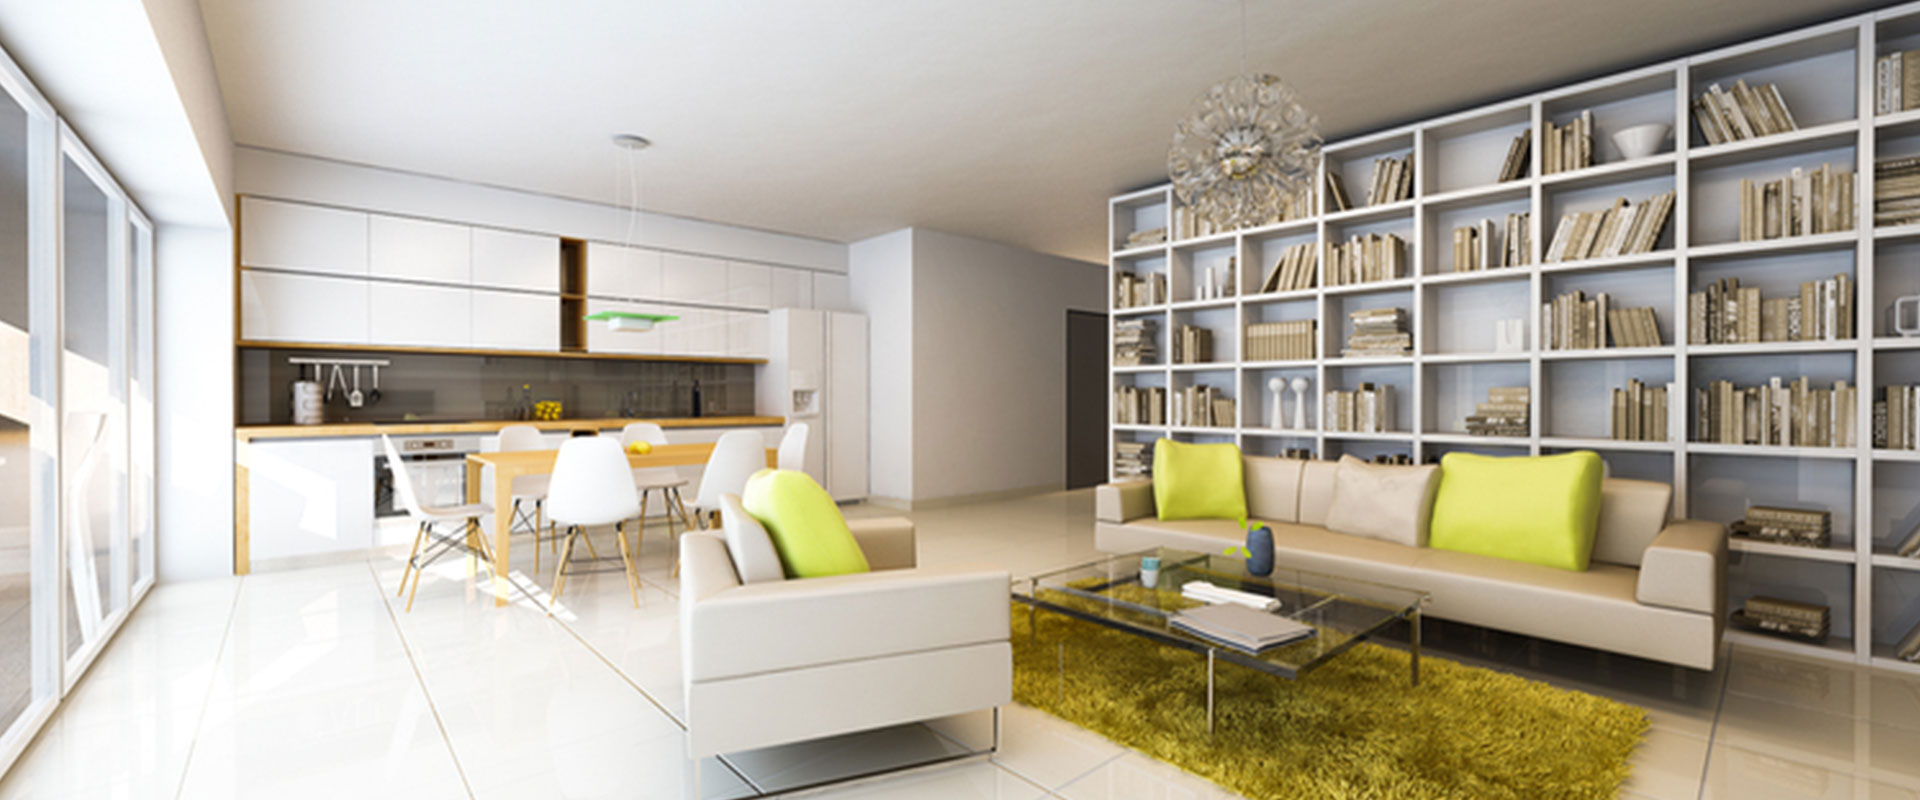 SWISS Apartments